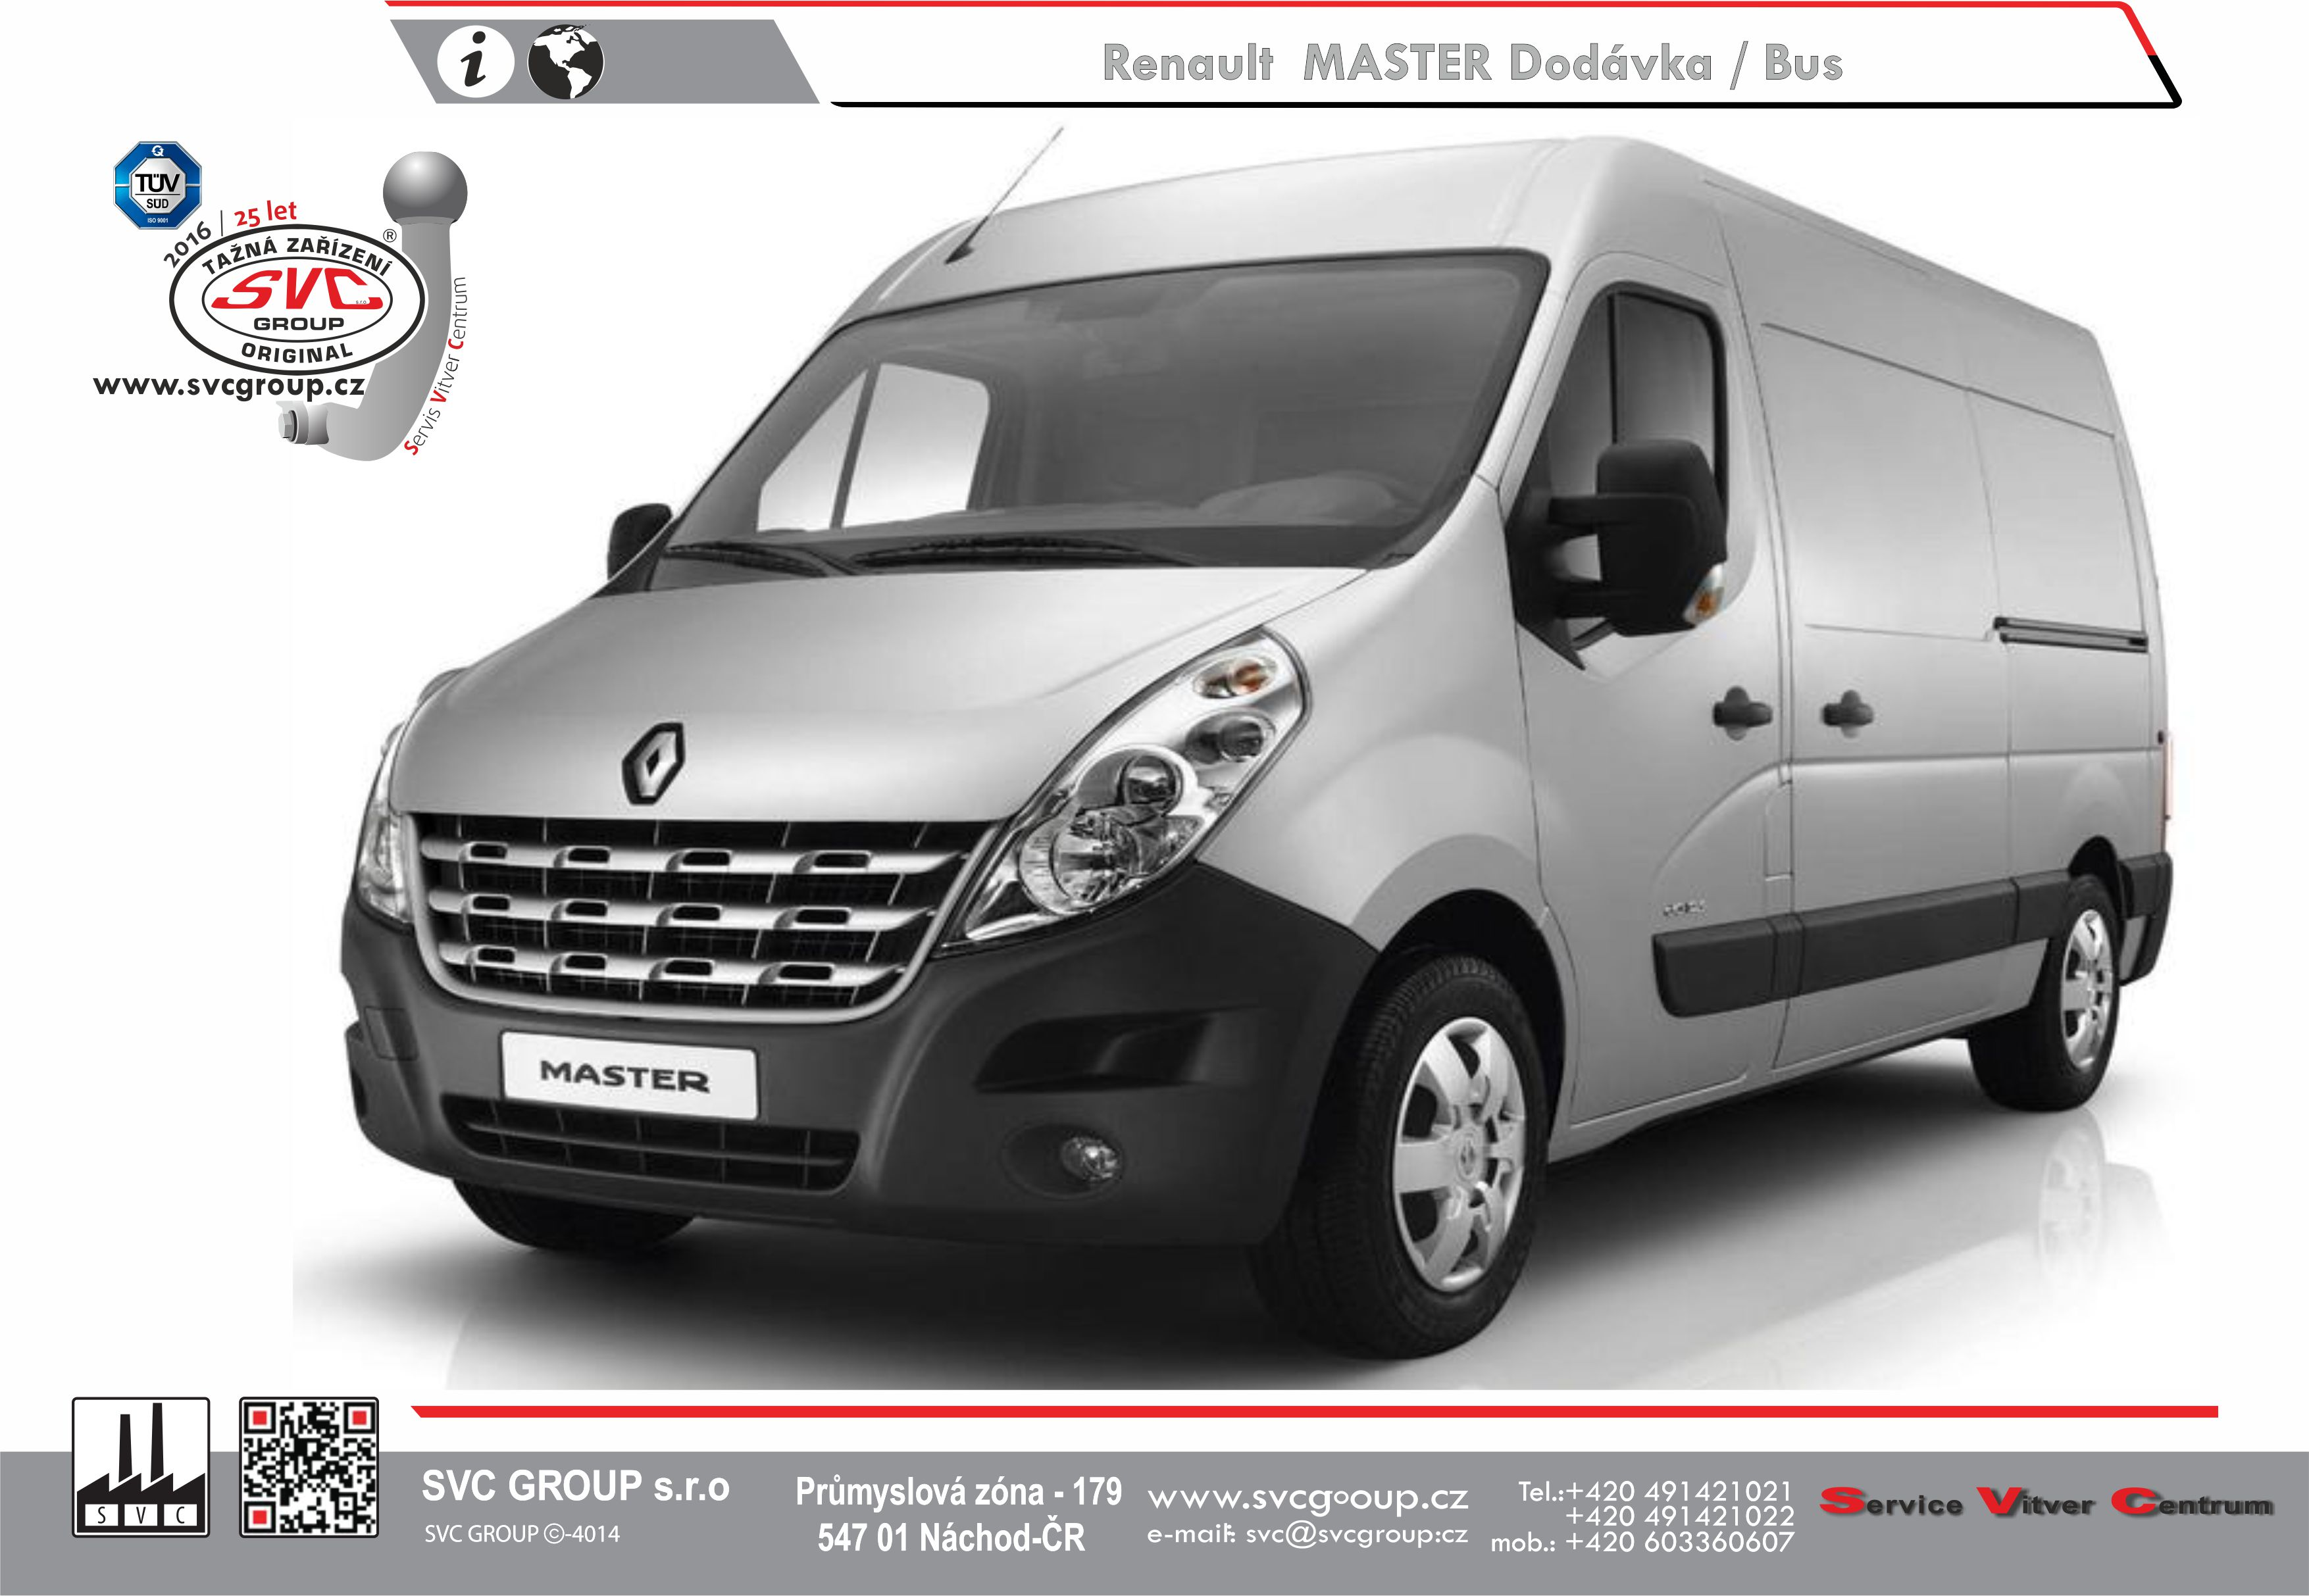 Renault Master Dodávka/Bus